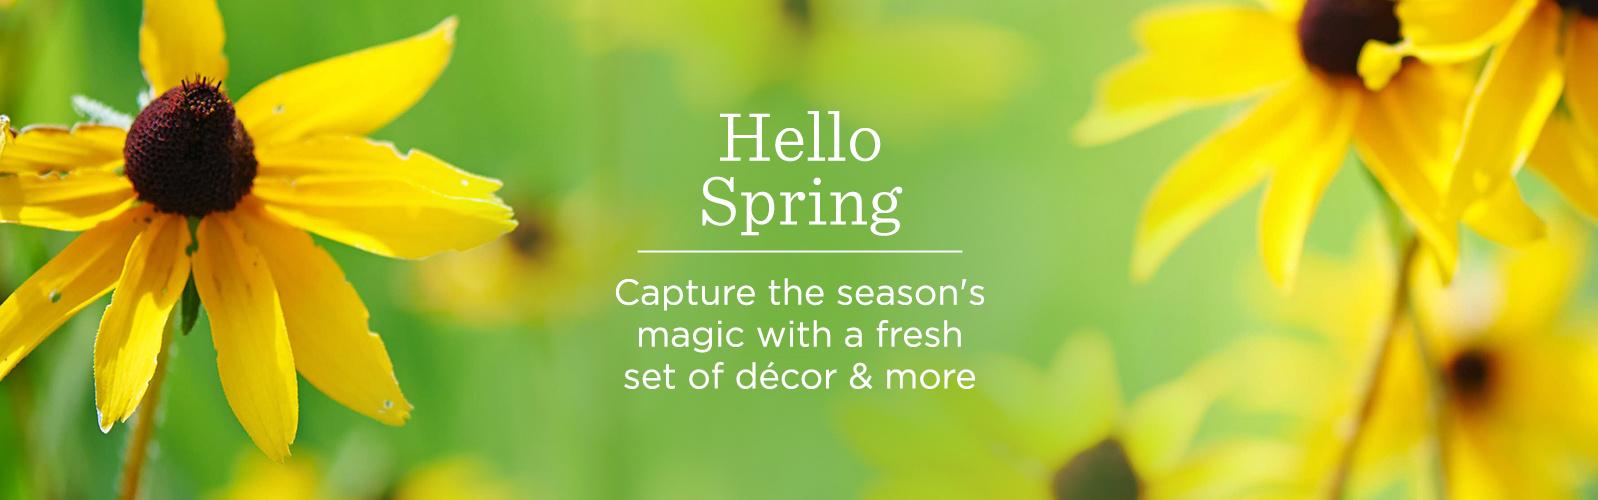 Hello Spring — Capture the season's magic with a fresh set of décor & more